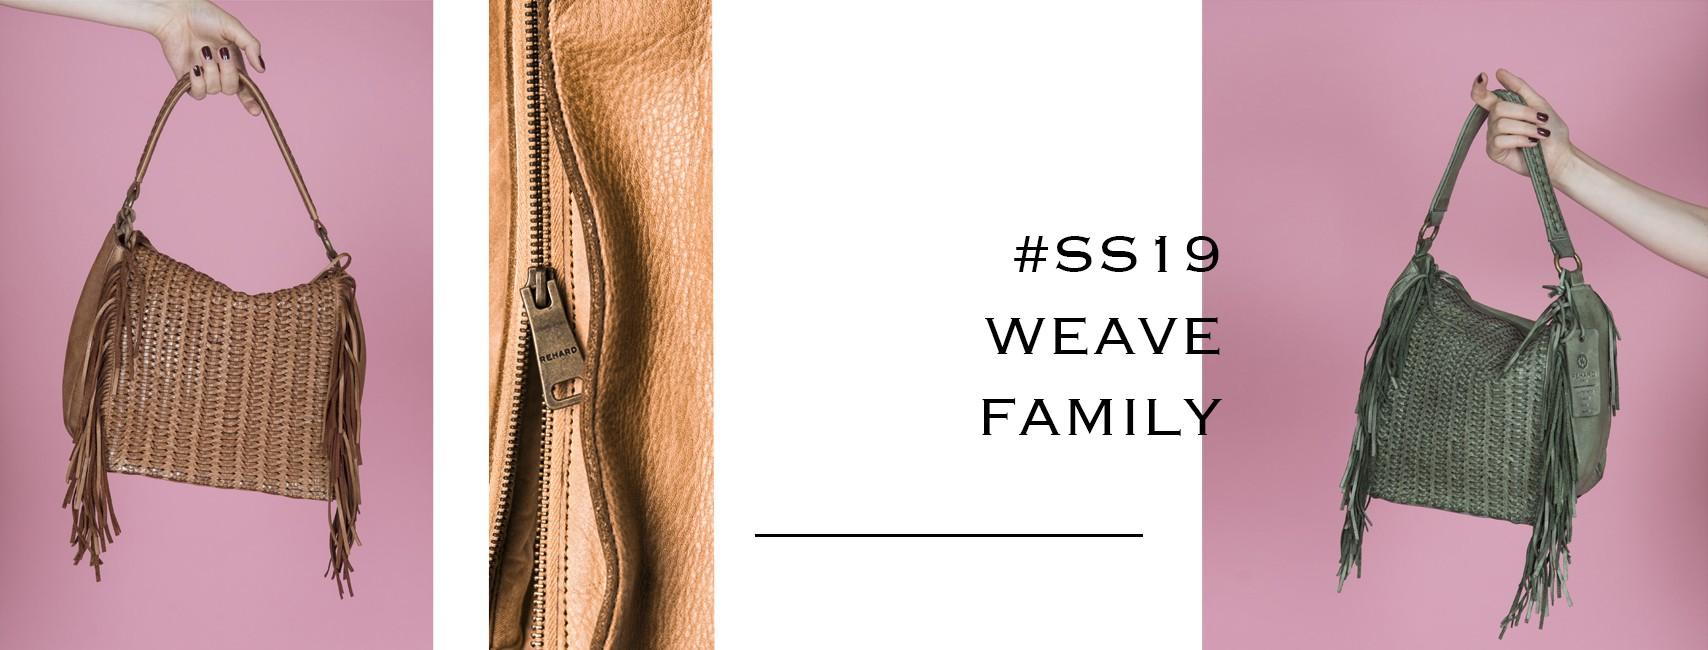 WEAVE FAMILY